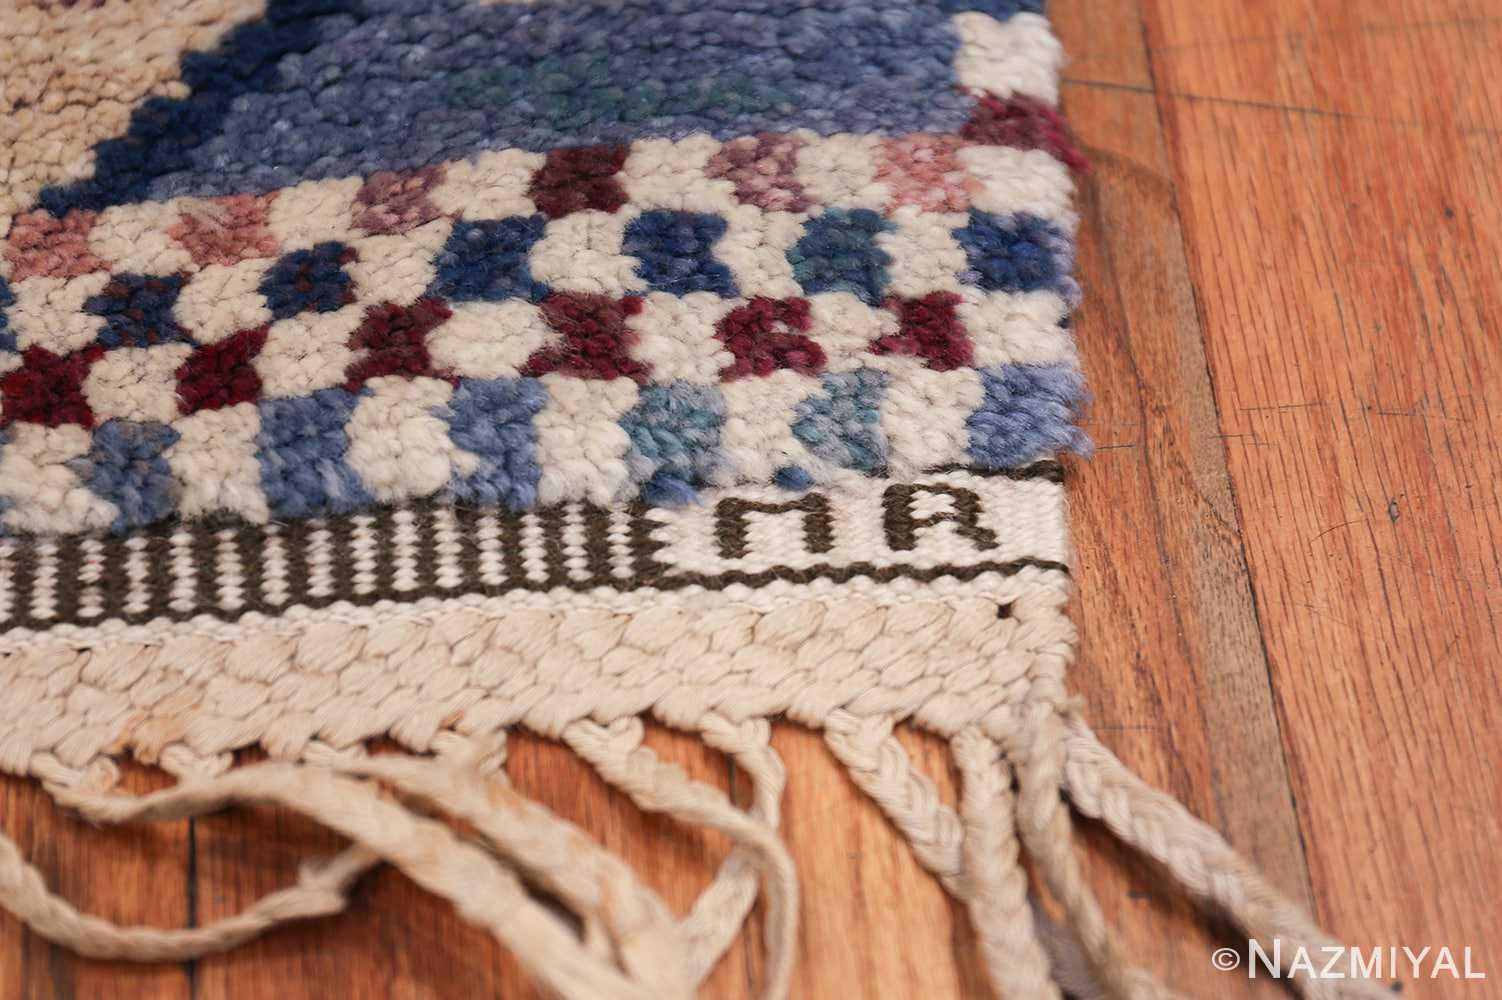 Marianne Richter vintage Scandinavian Pile Rug For Marta Mass 49824 MR Signature Initials Nazmiyal